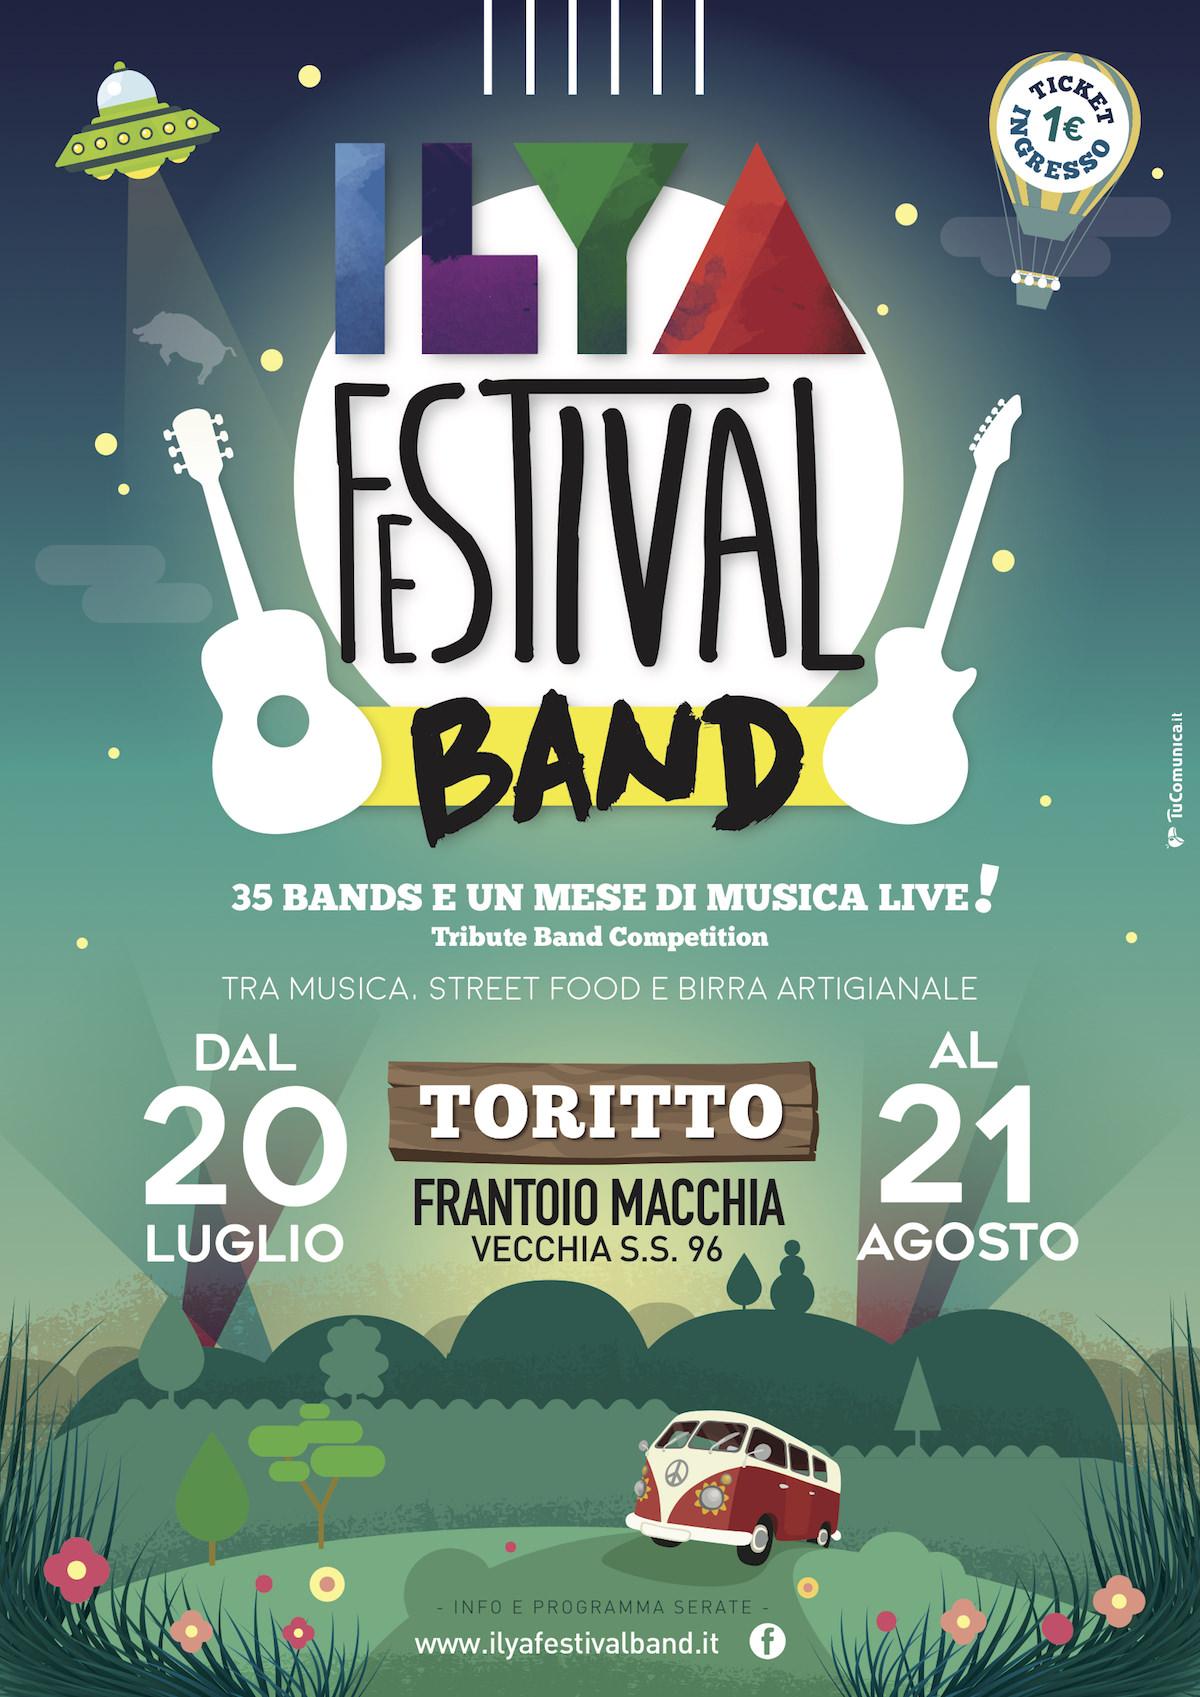 music-festival-band-locandina-design